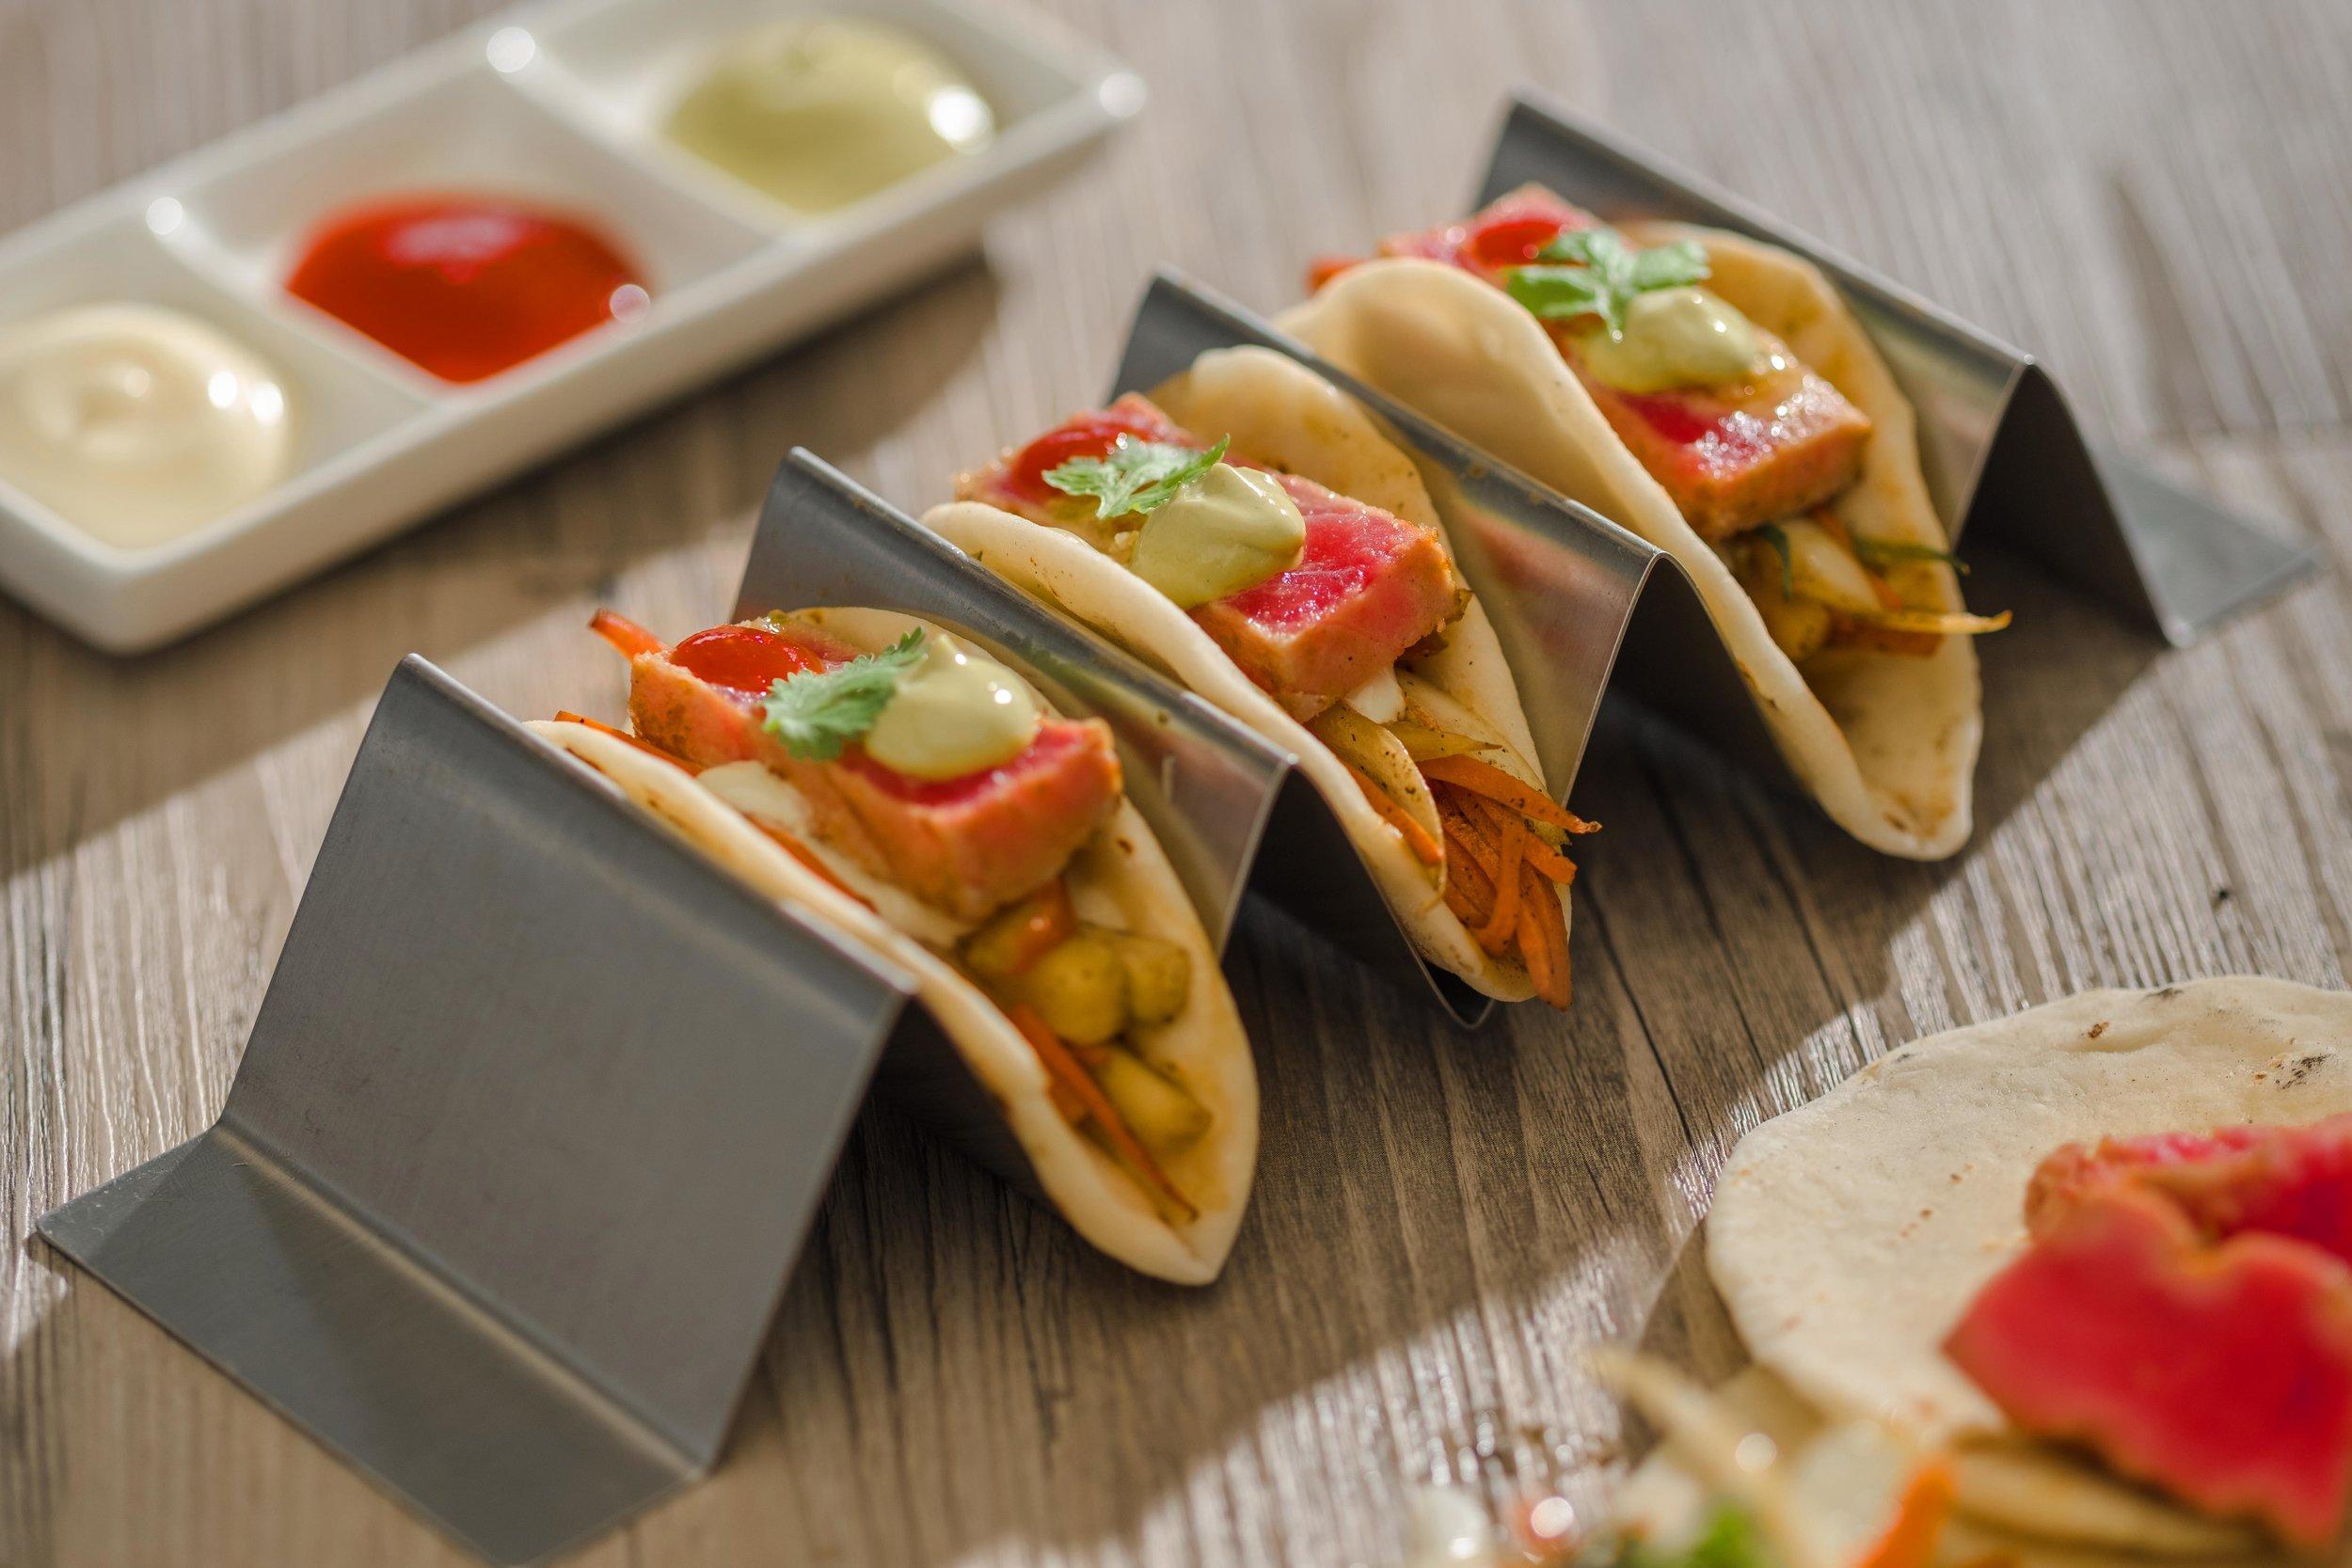 Tuna Tacos at The Seaside Saloon